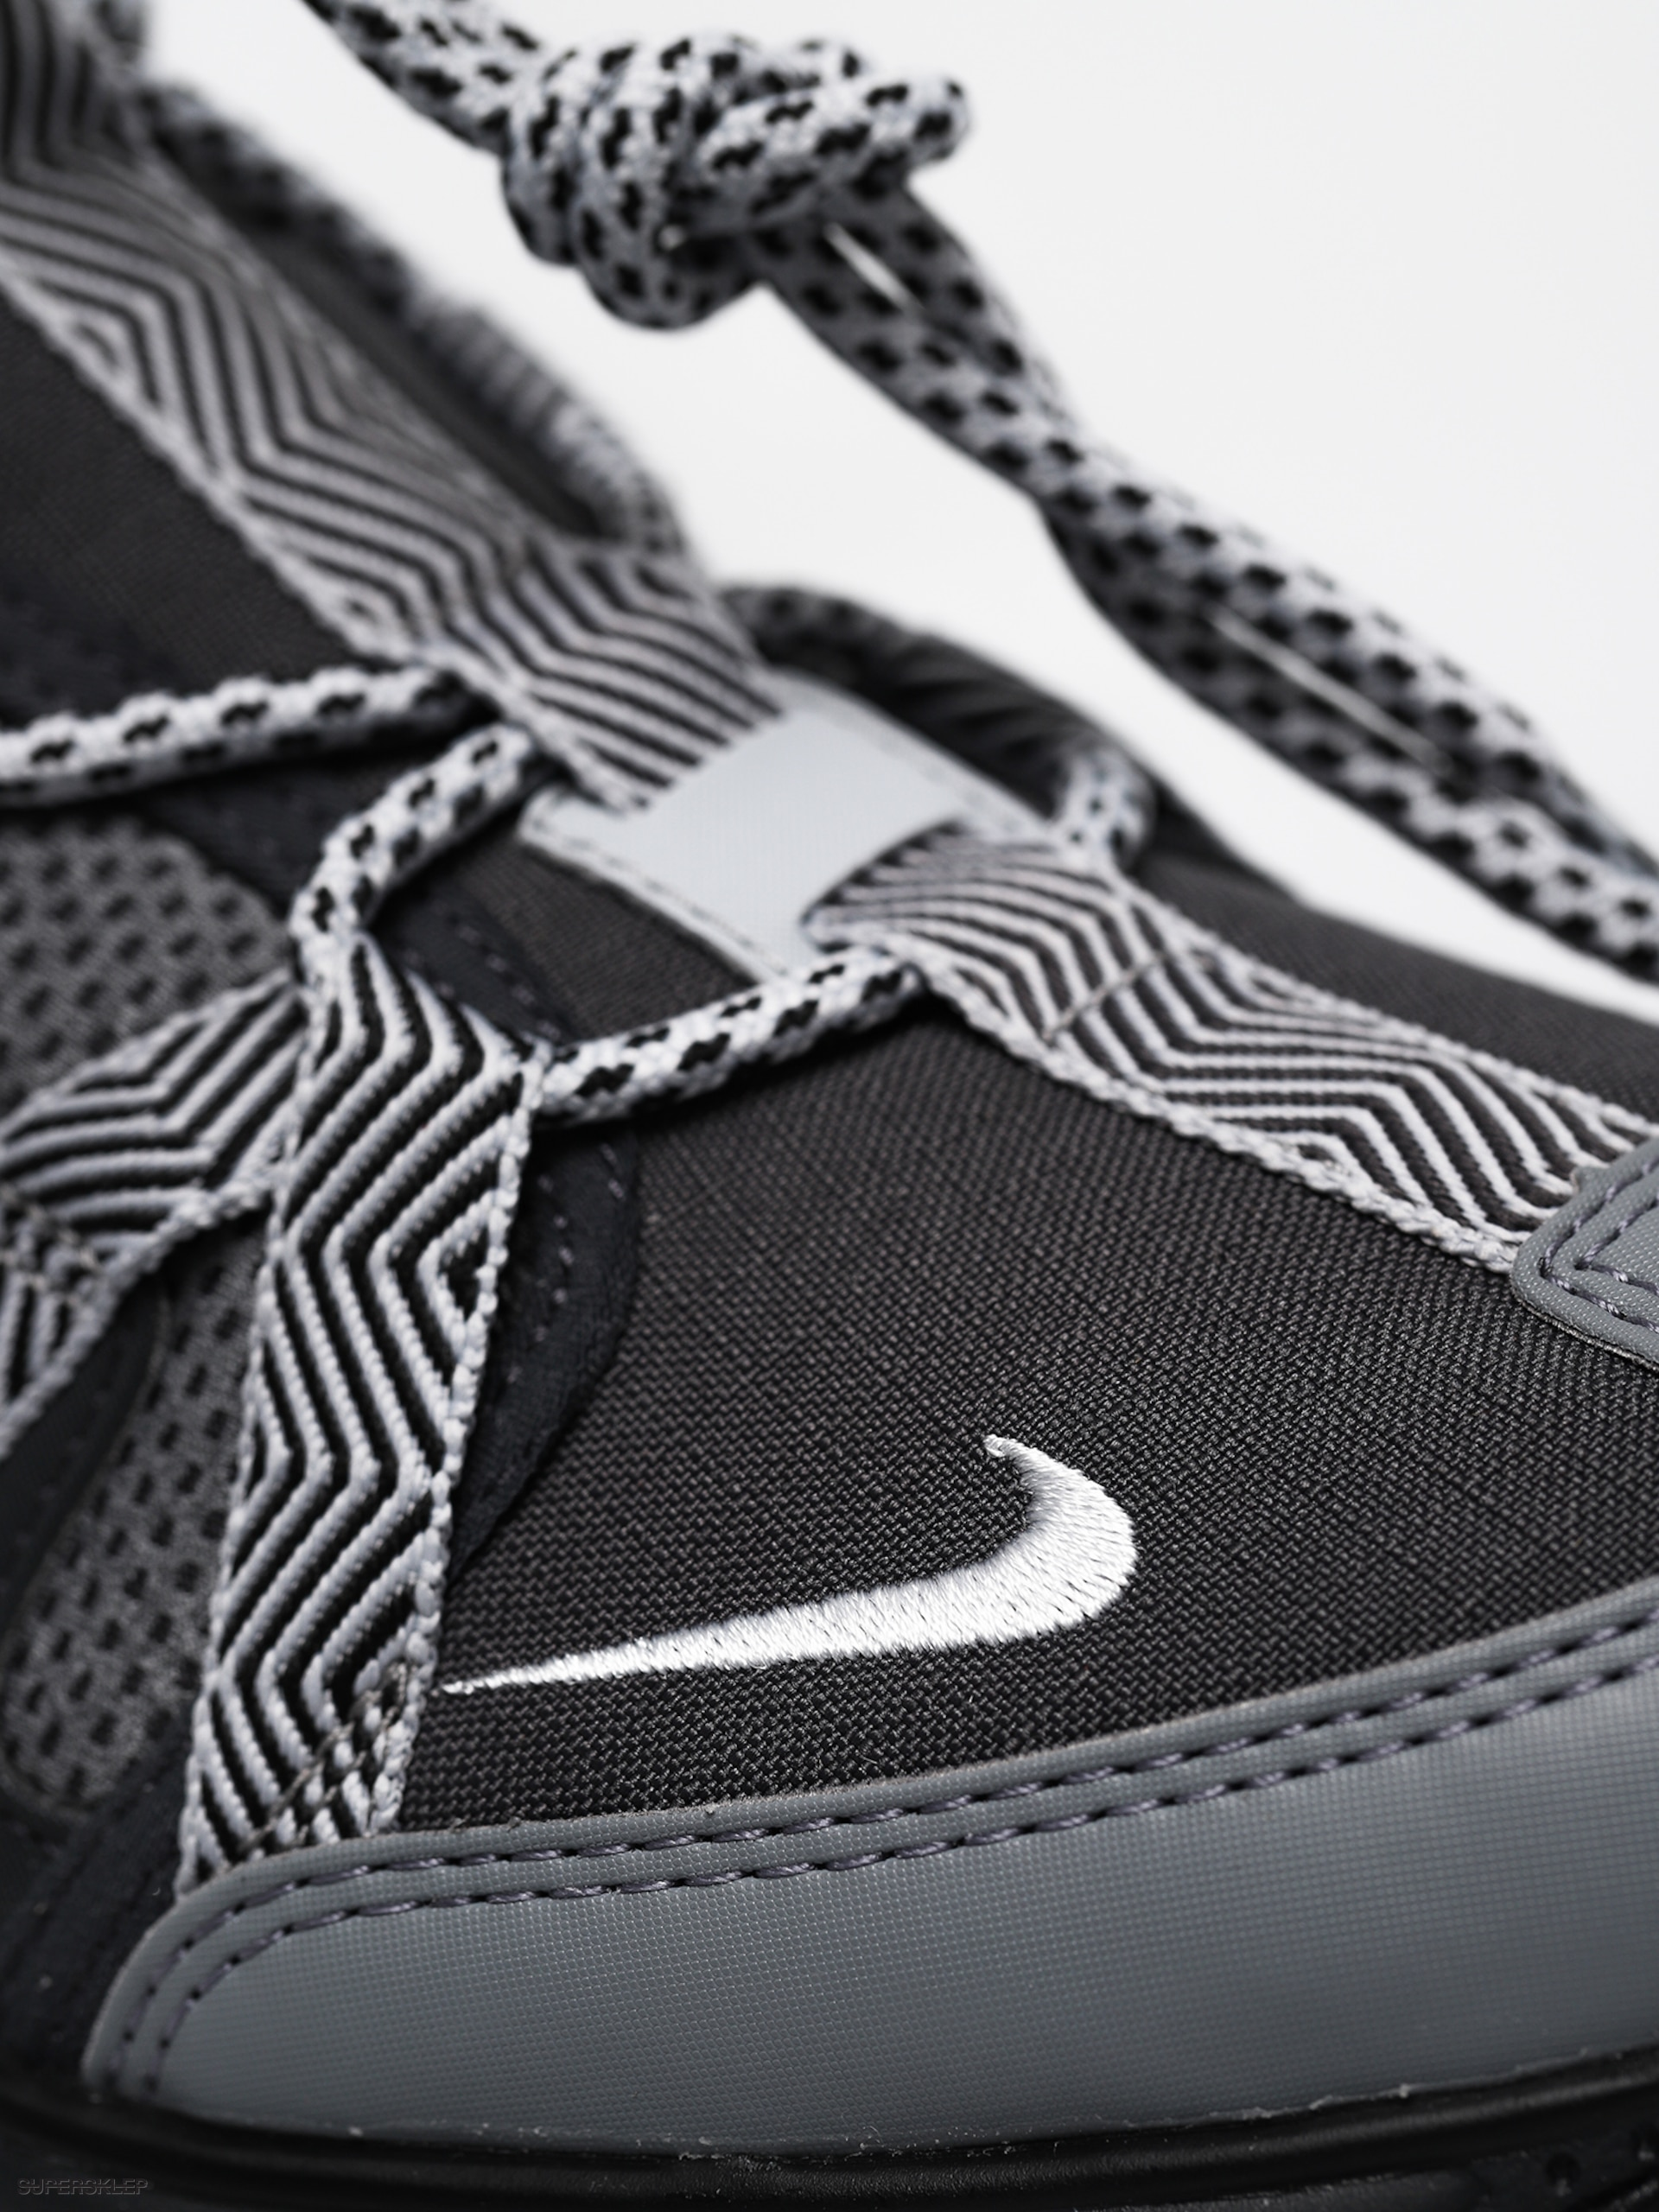 Nike Air Max 270 Bowfin AnthraciteMetallic Silver Cool Grey